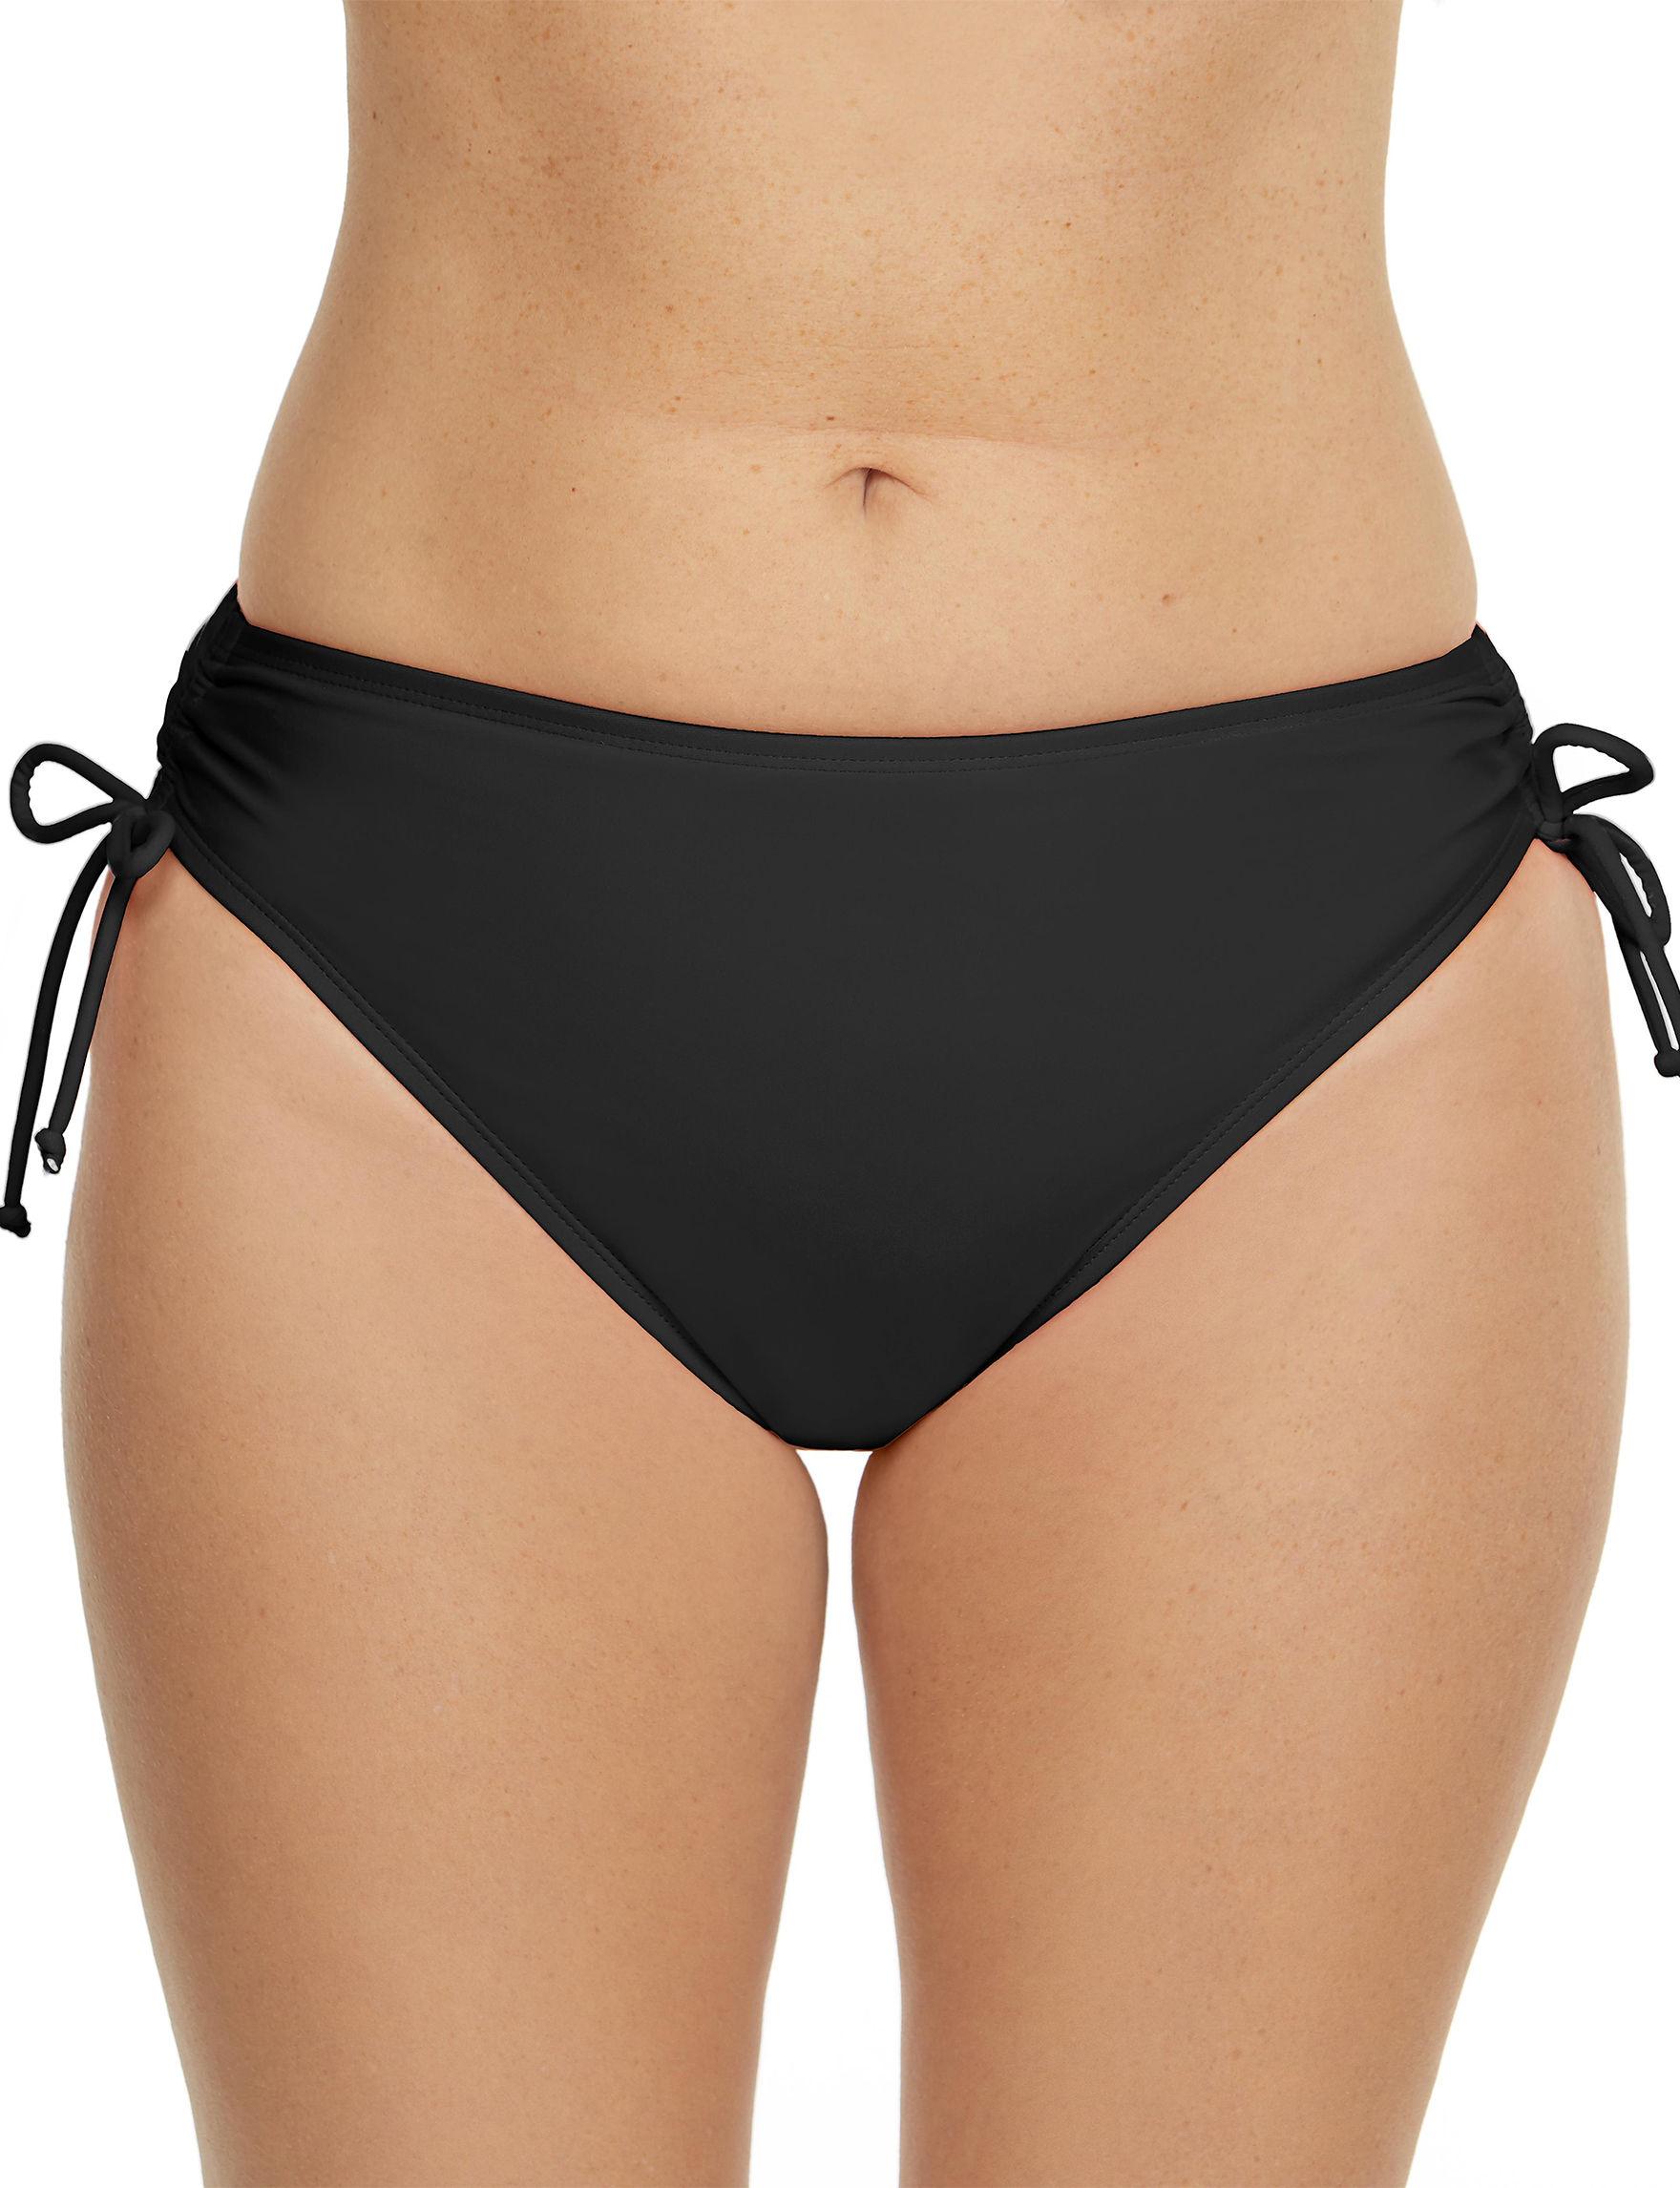 Beach Diva Black Swimsuit Bottoms Bikini High Waist